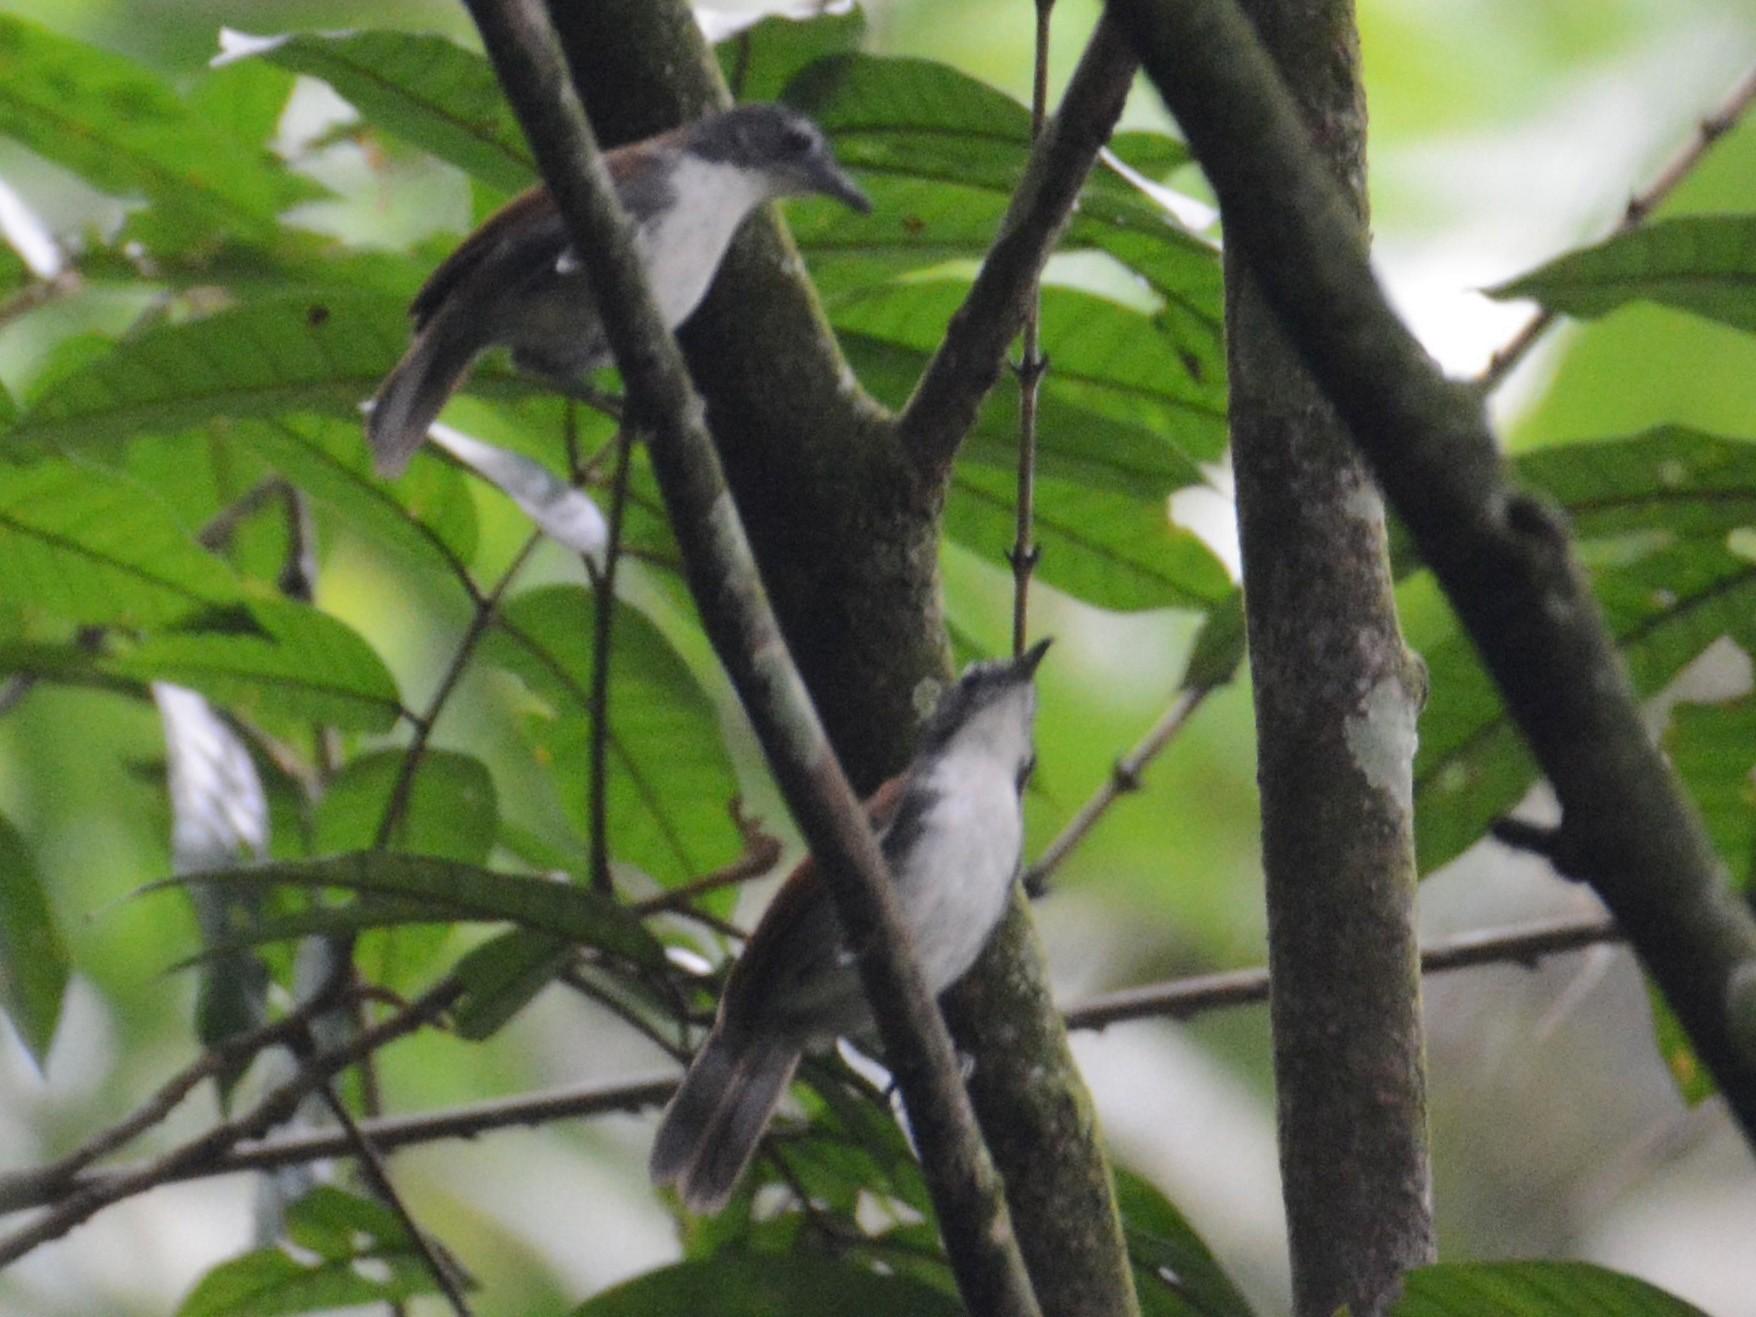 White-breasted Babbler - Ari Noviyono